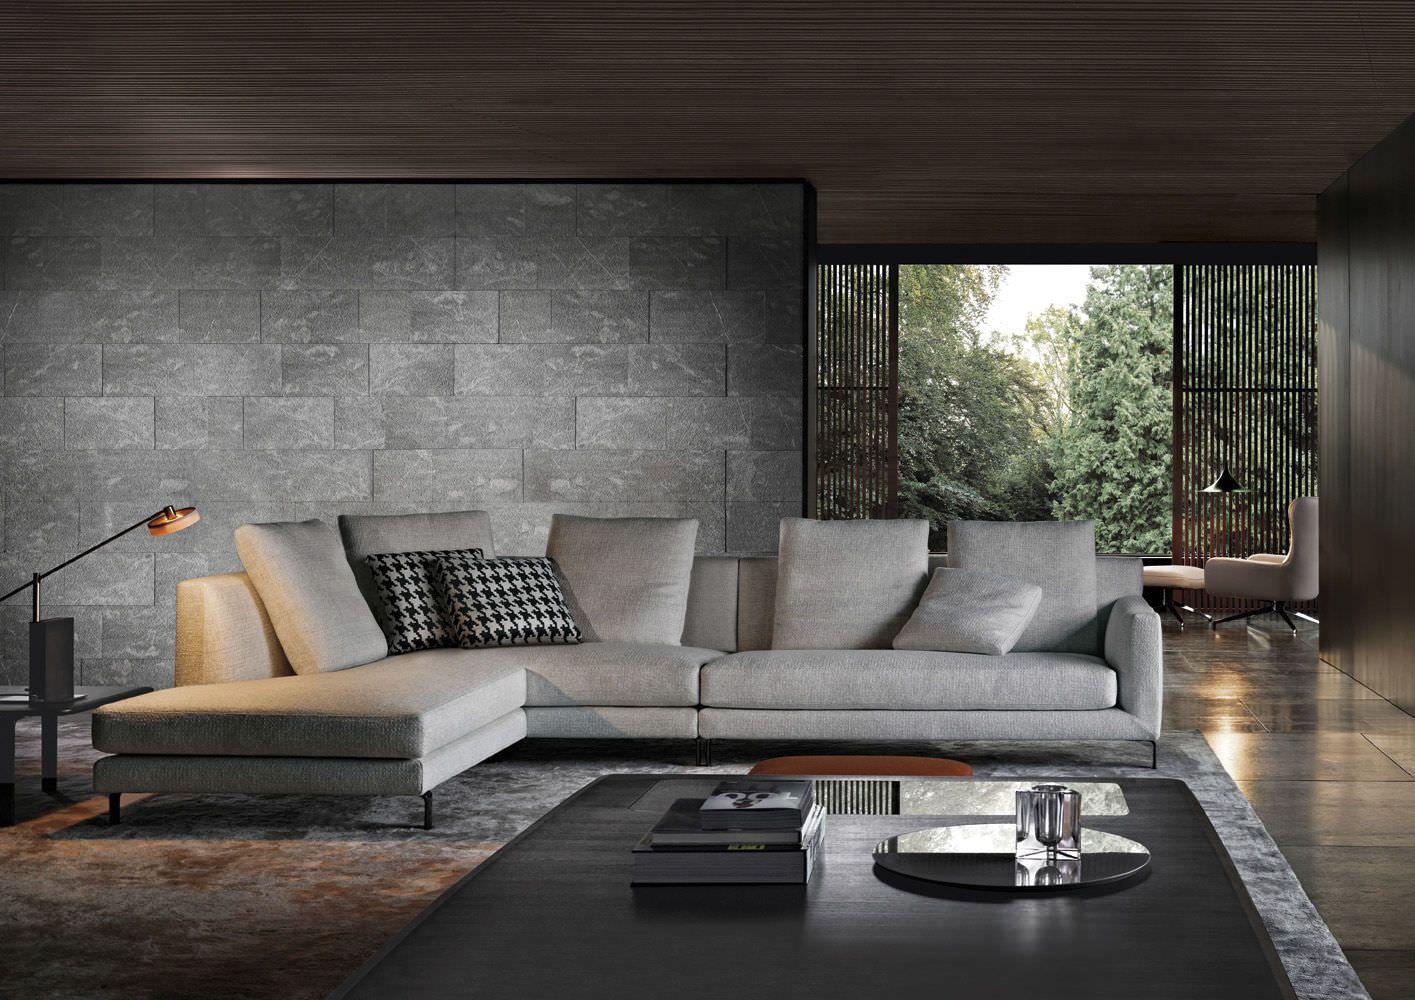 Voltage furniture cincinnati oh european furniture lighting and accessories